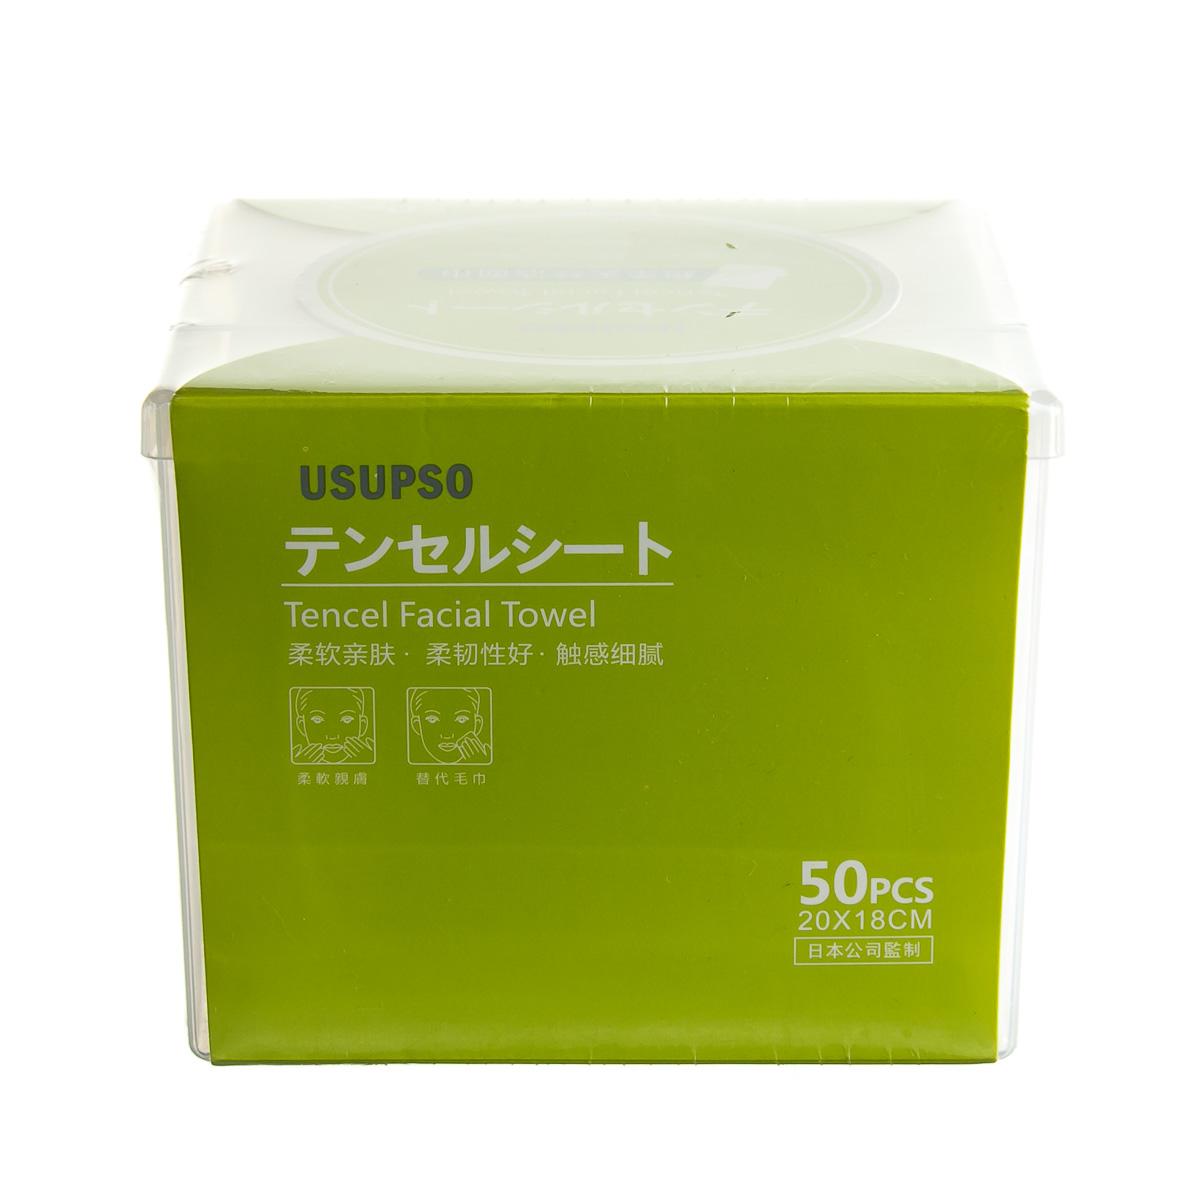 Салфетки для лица в коробке 50 шт